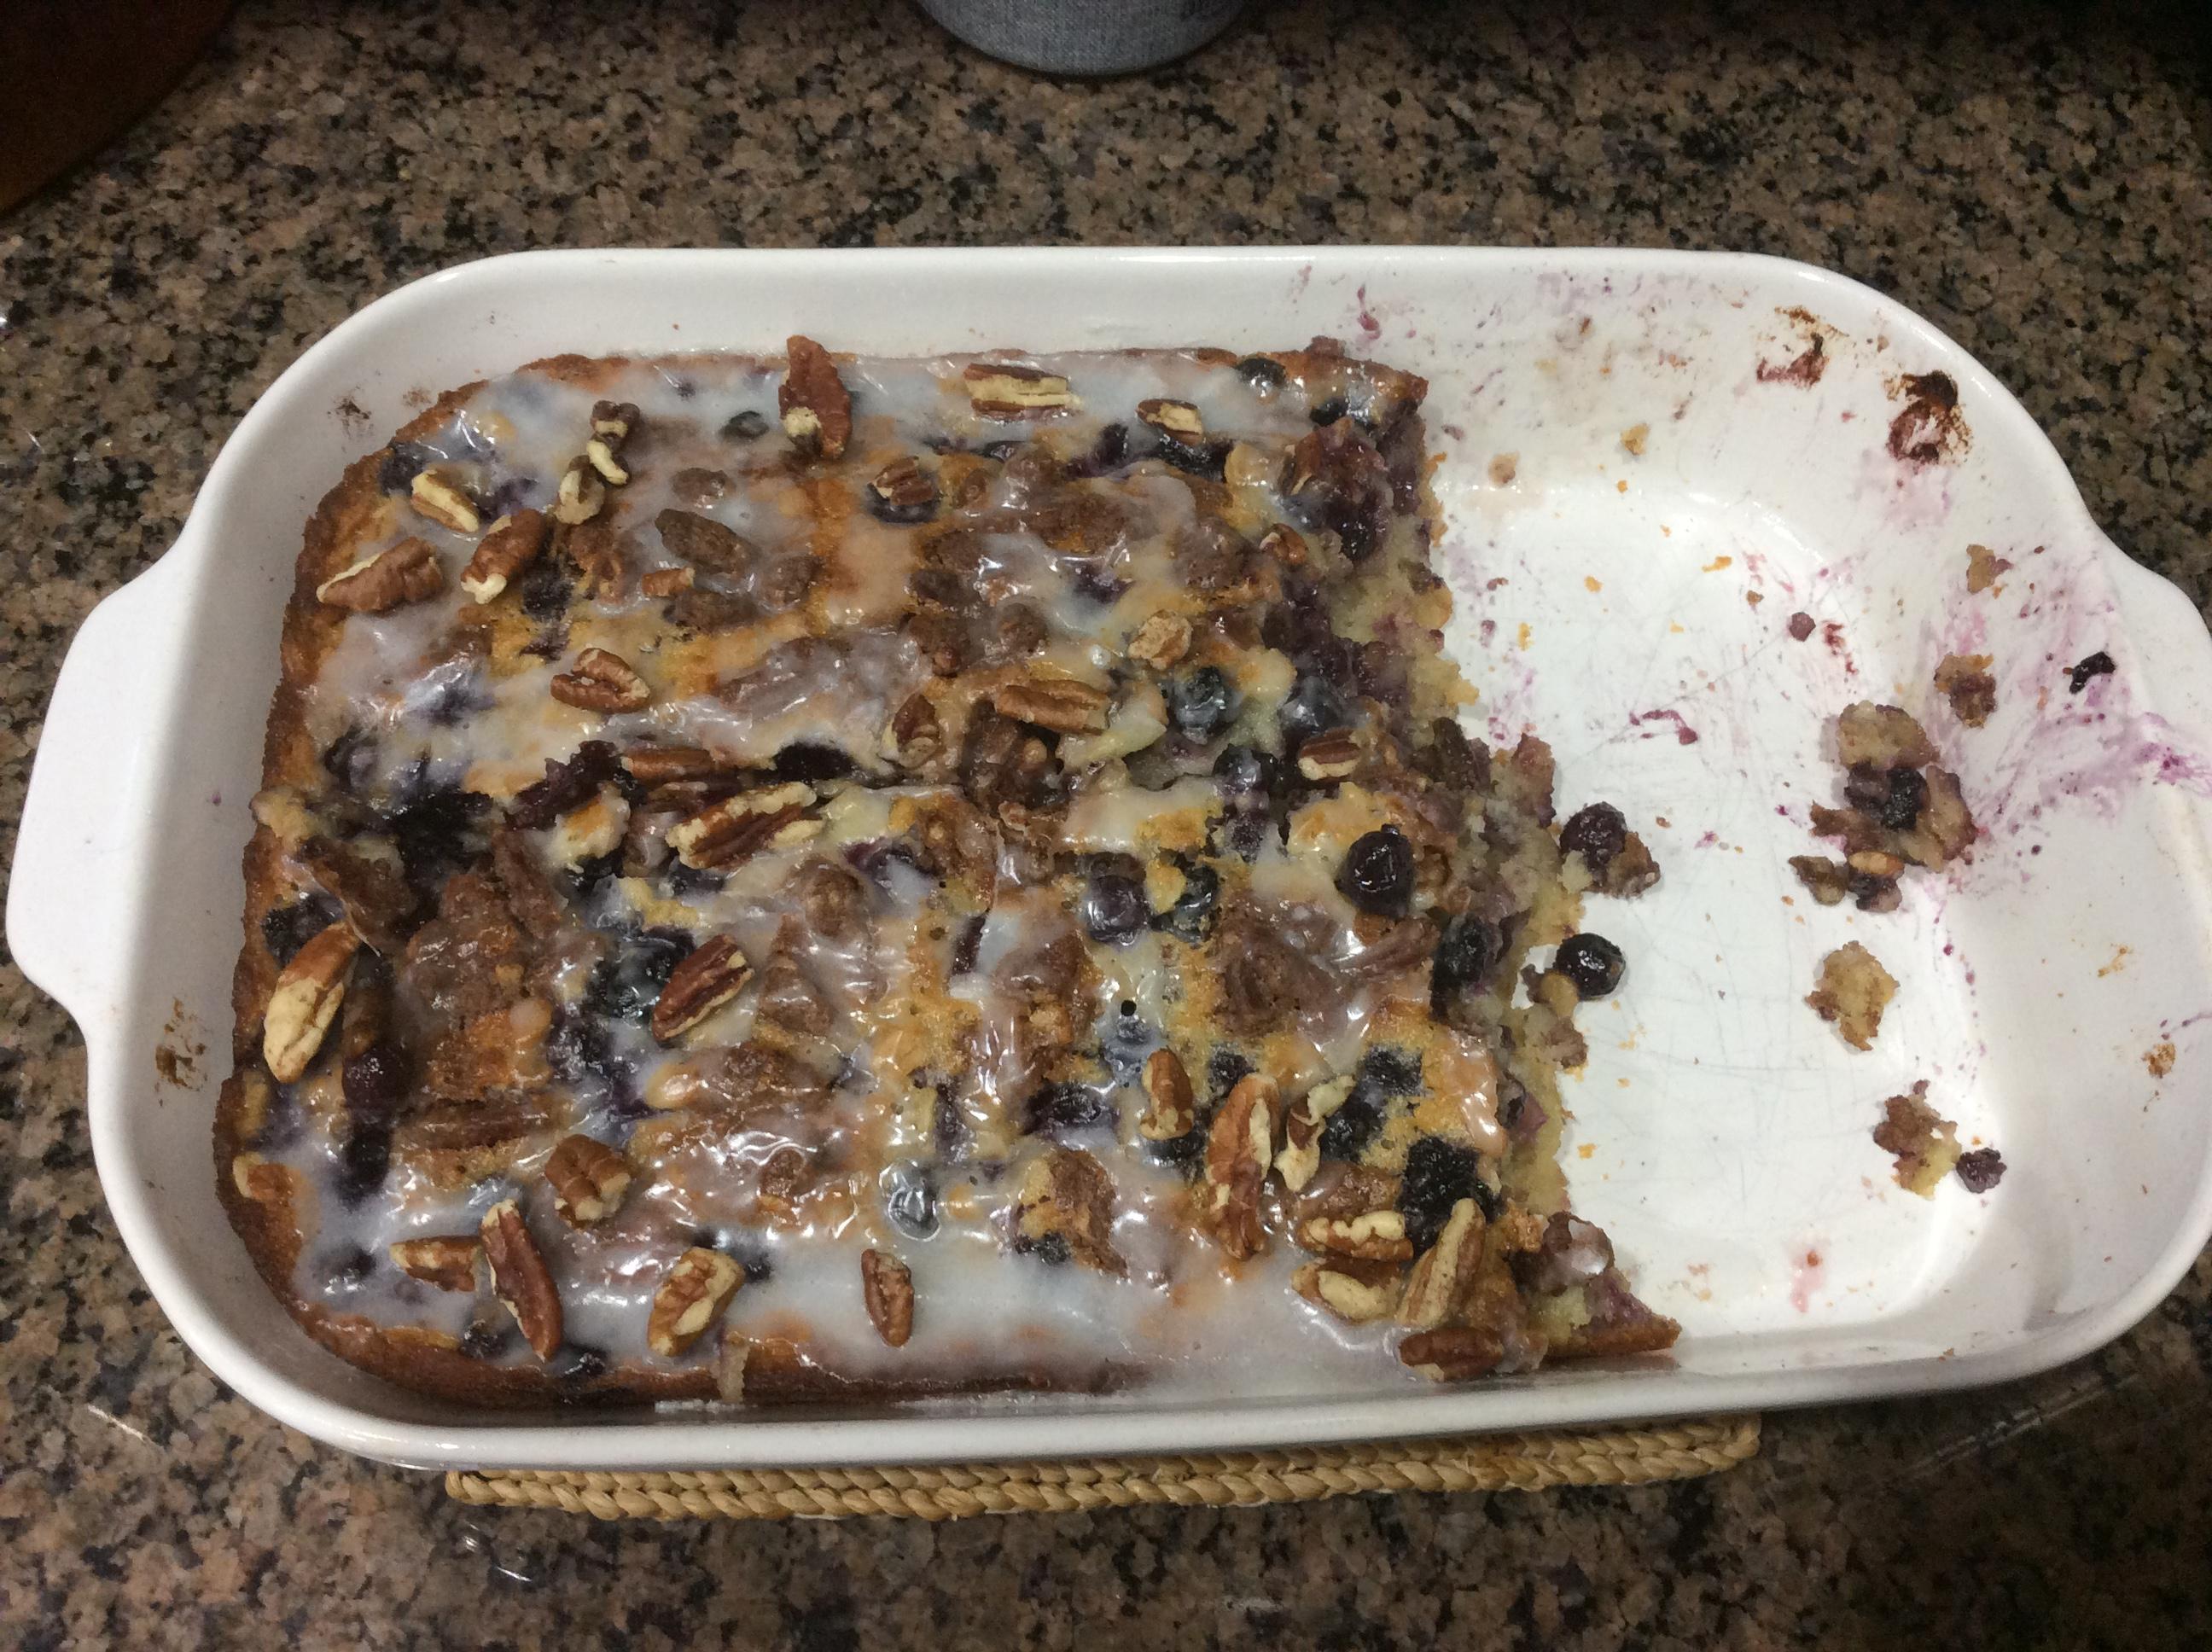 Blueberry-Banana Coffee Cake Sloopie1